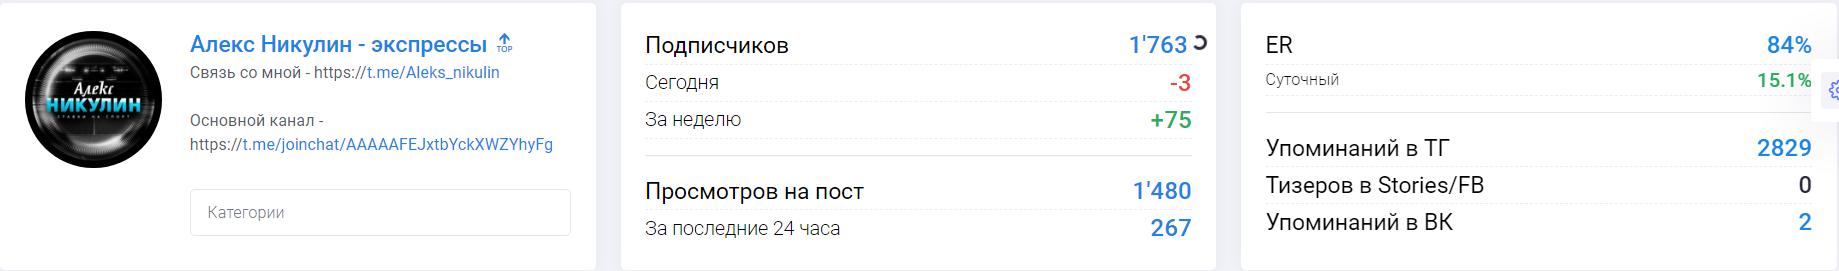 "Процент активности канала ""Алекс Никулин - экспрессы"""